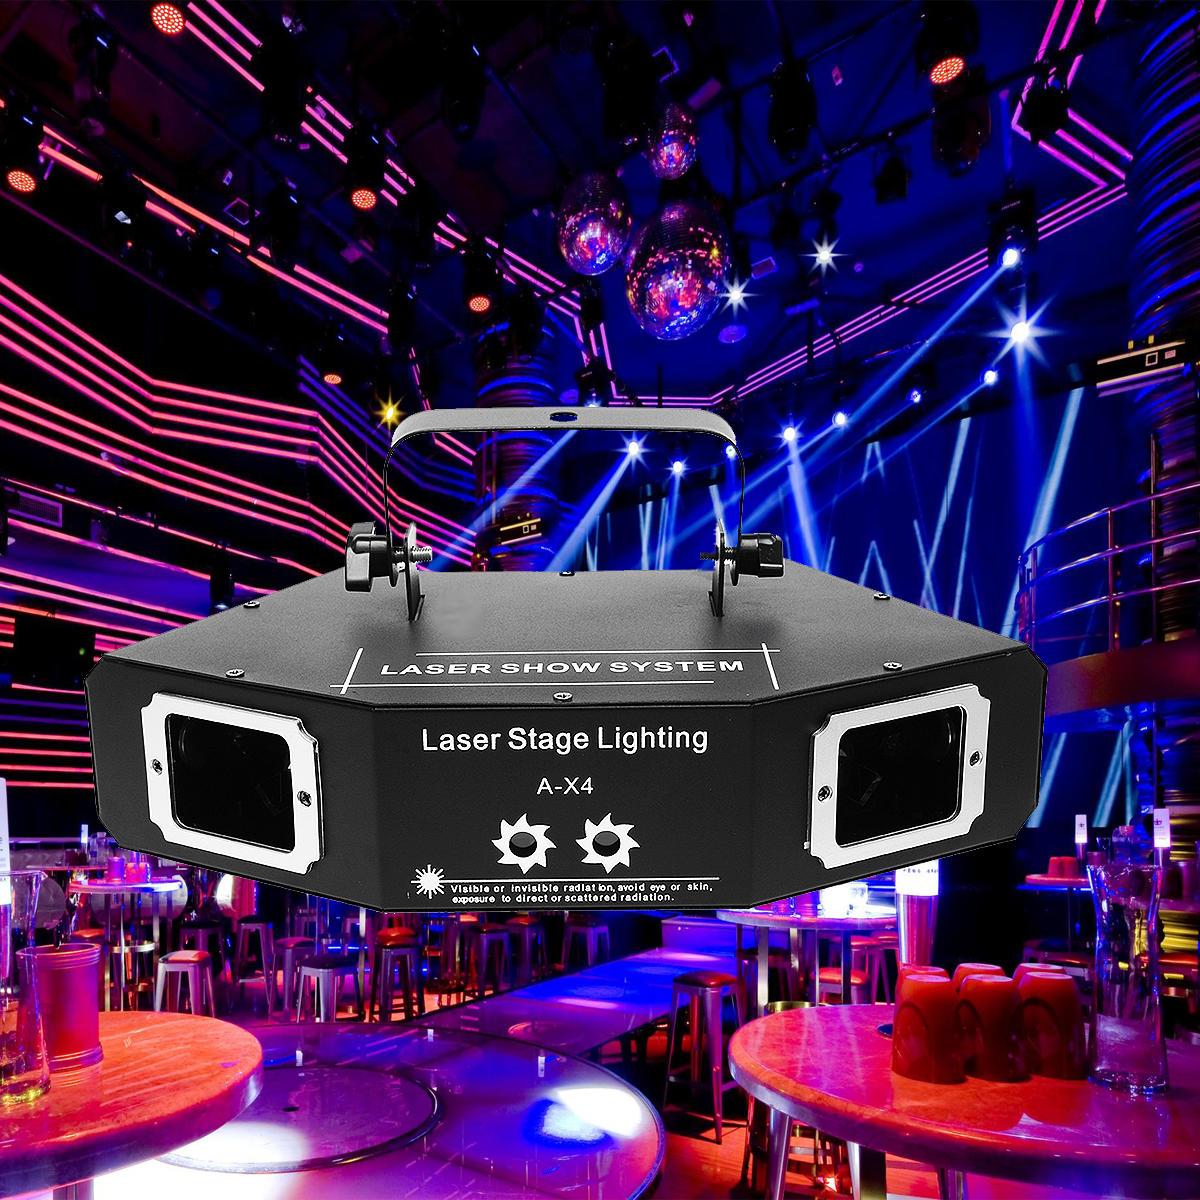 Dmx 4 Len Rgb Pattern Beam Network Laser Light Home Party Dj Ktv Stage Lighting